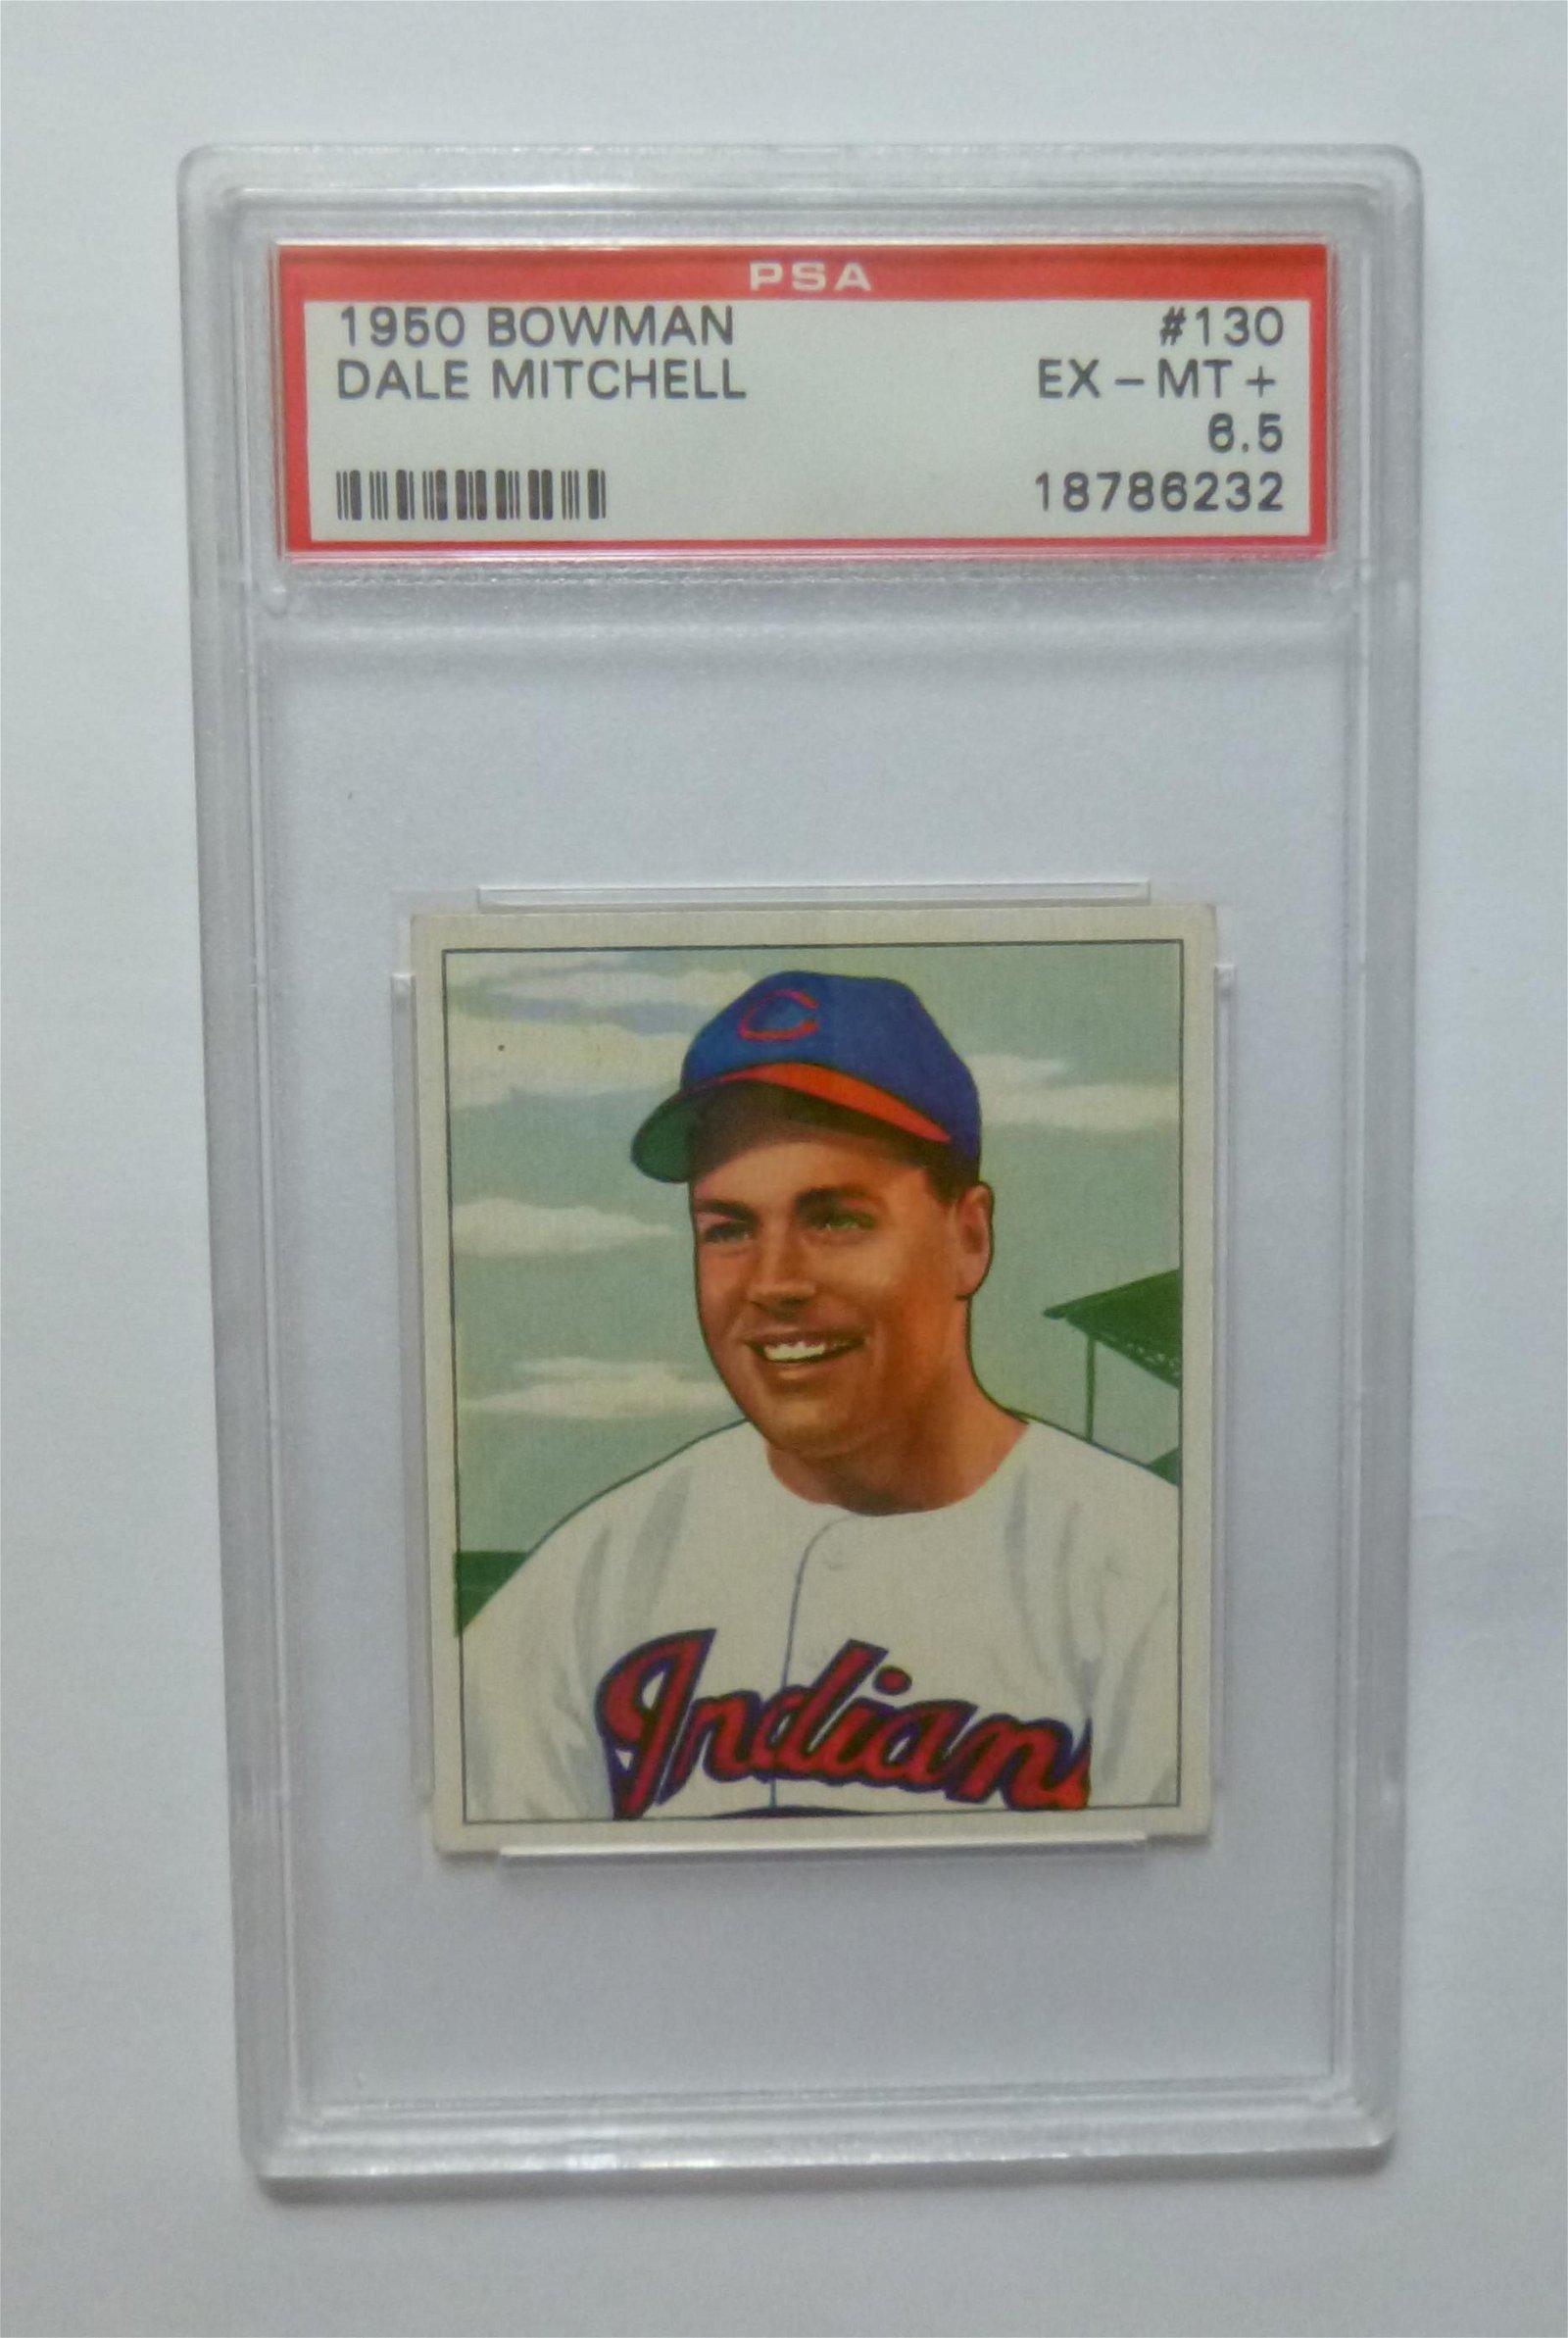 1950 Bowman #130 Dale Mitchell PSA 6.5